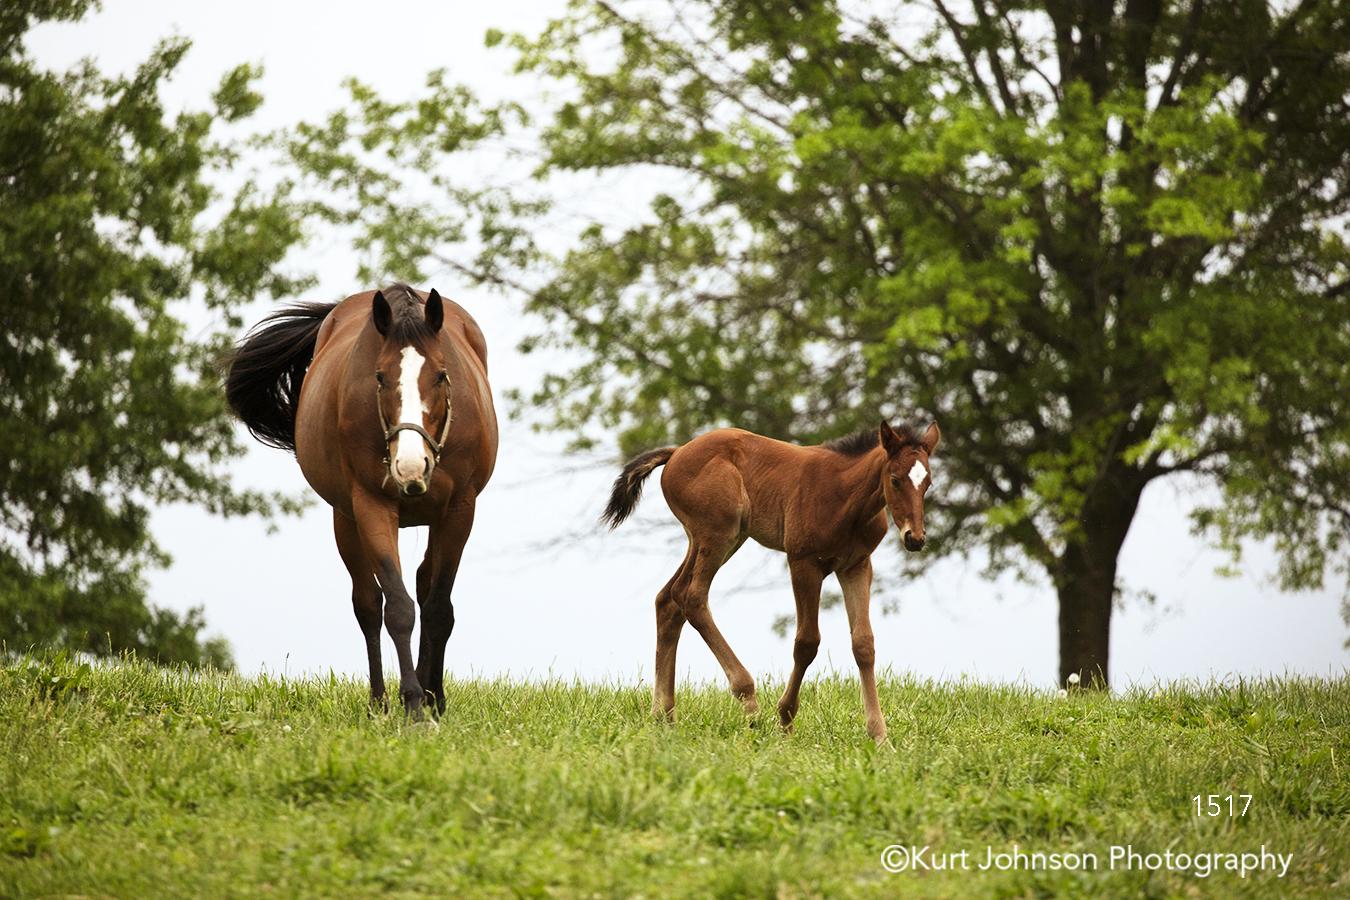 brown horse horses pony green grass grasses tree wildlife animal cute children's art nature children farm field